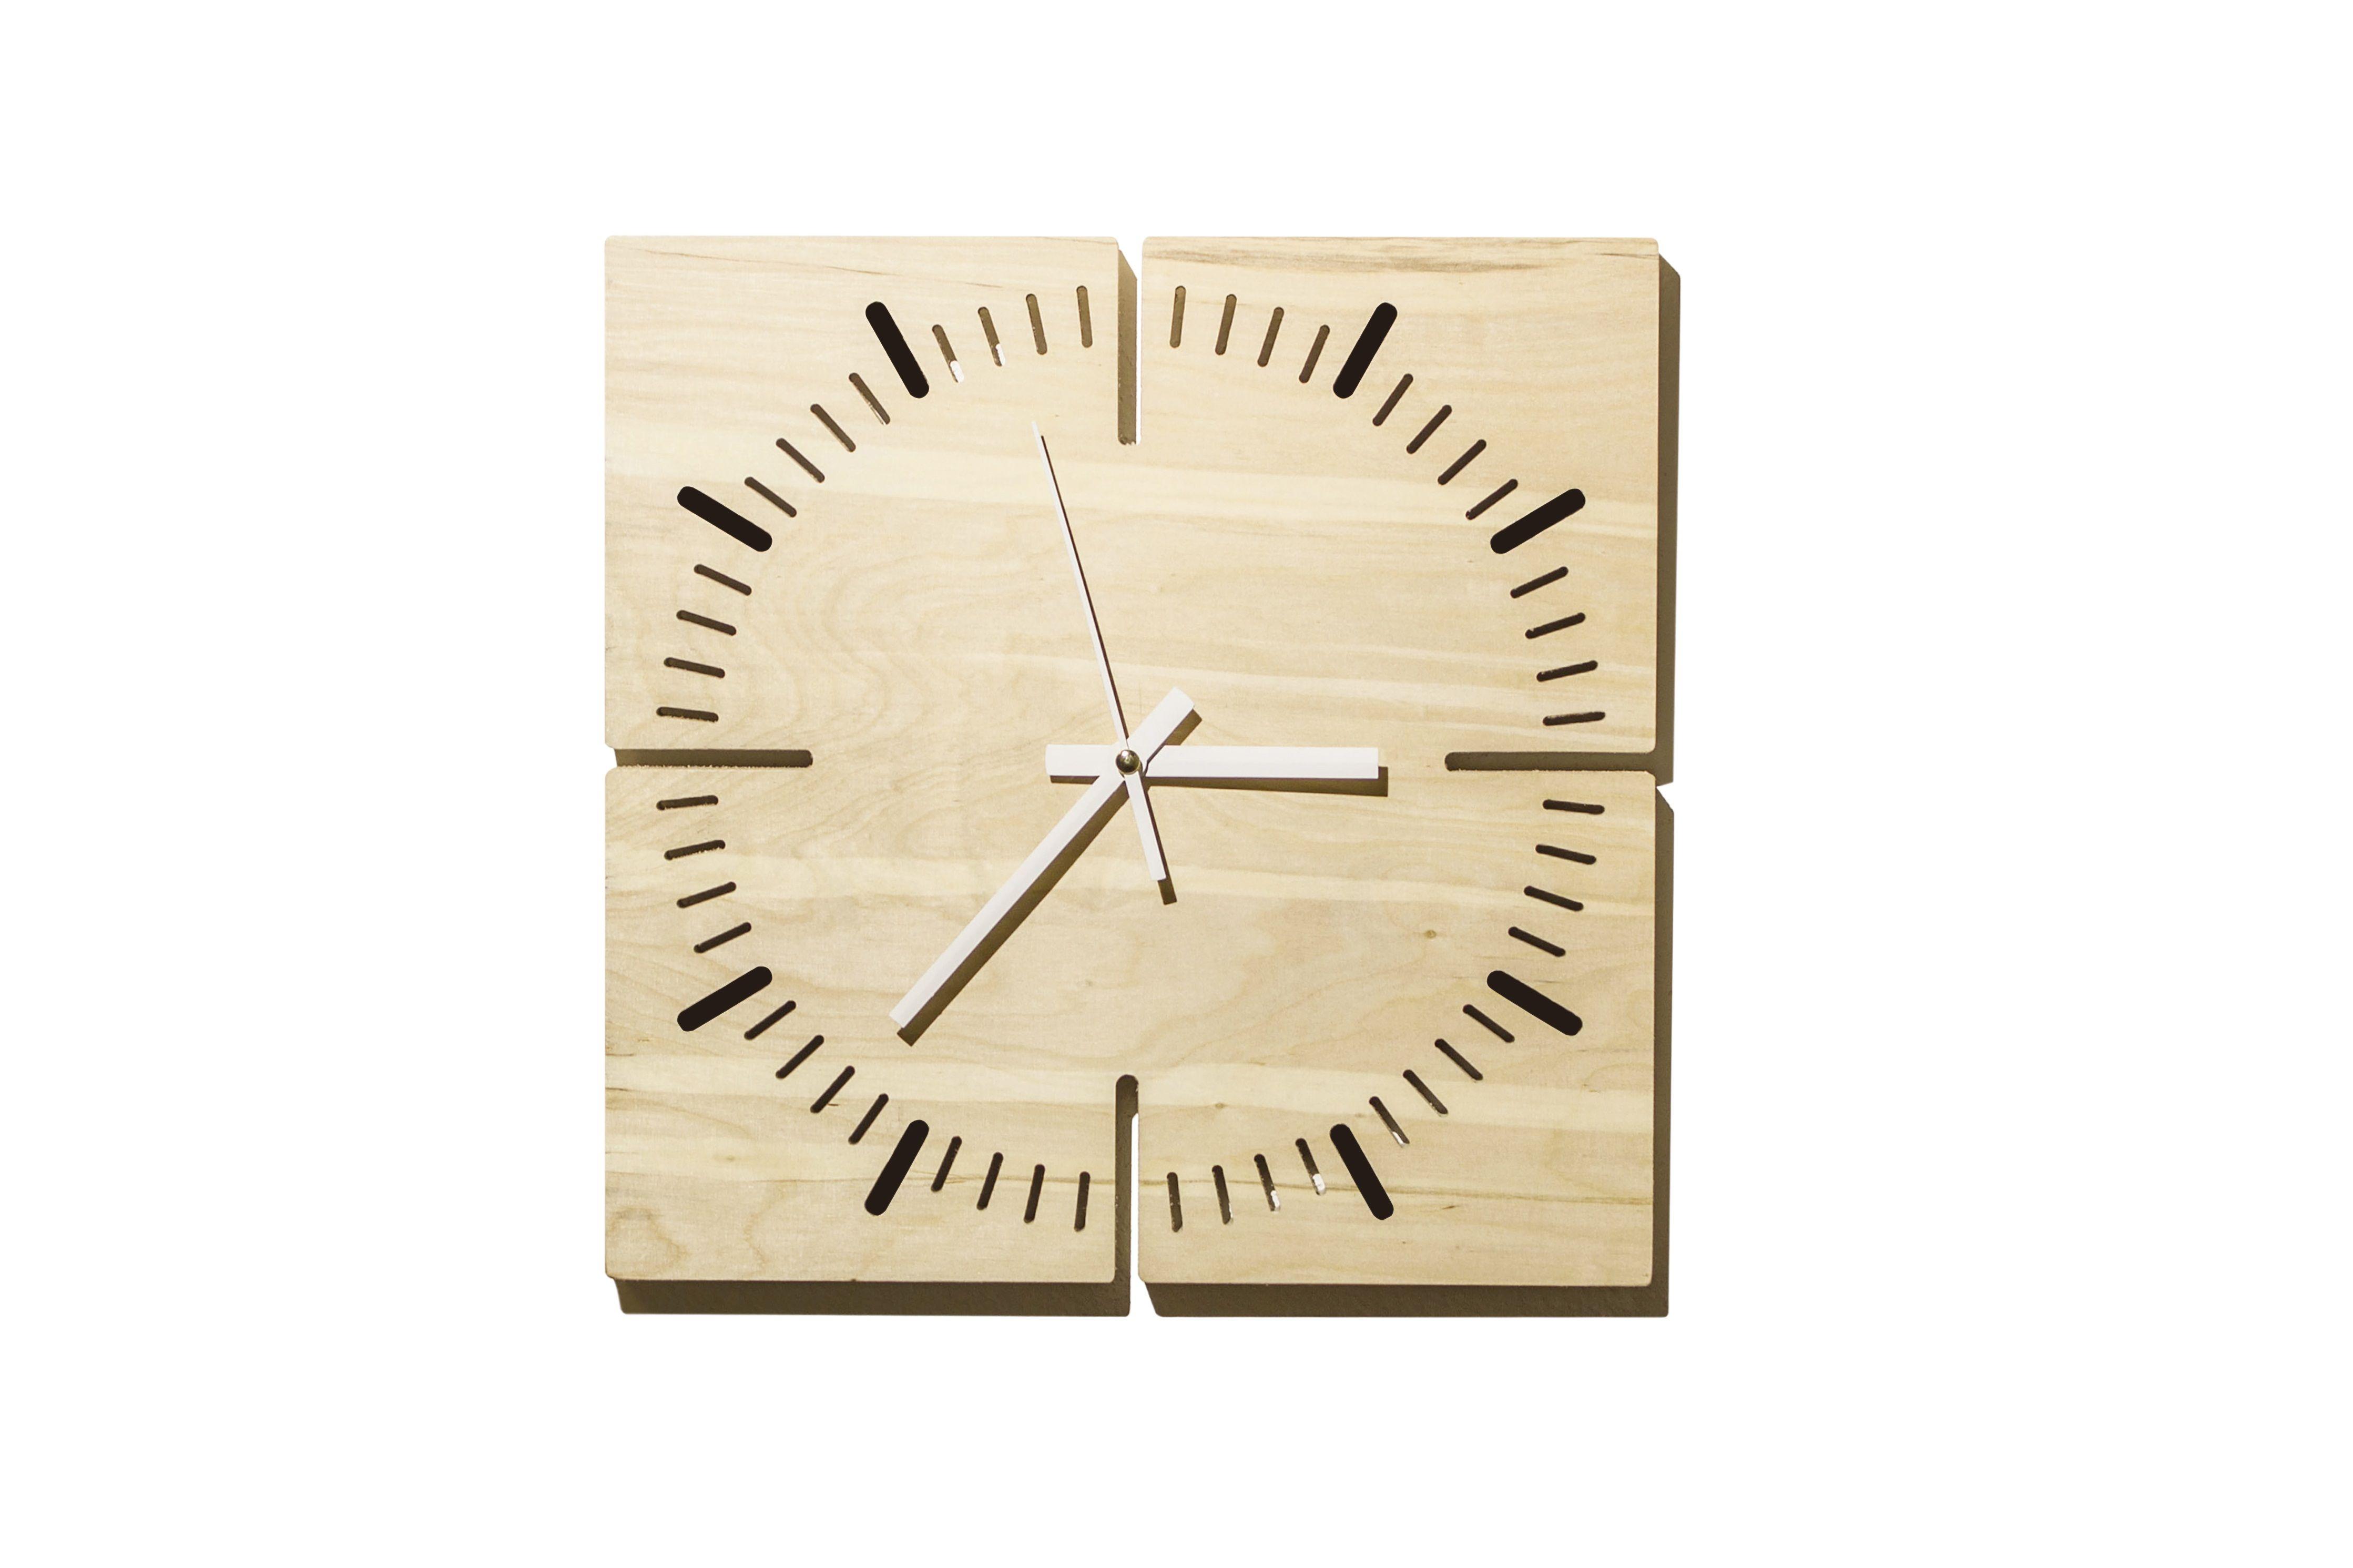 Toklok is an original wall clock complete with movement and hour toklok is an original wall clock complete with movement and hour and minutes hands toklok is amipublicfo Gallery